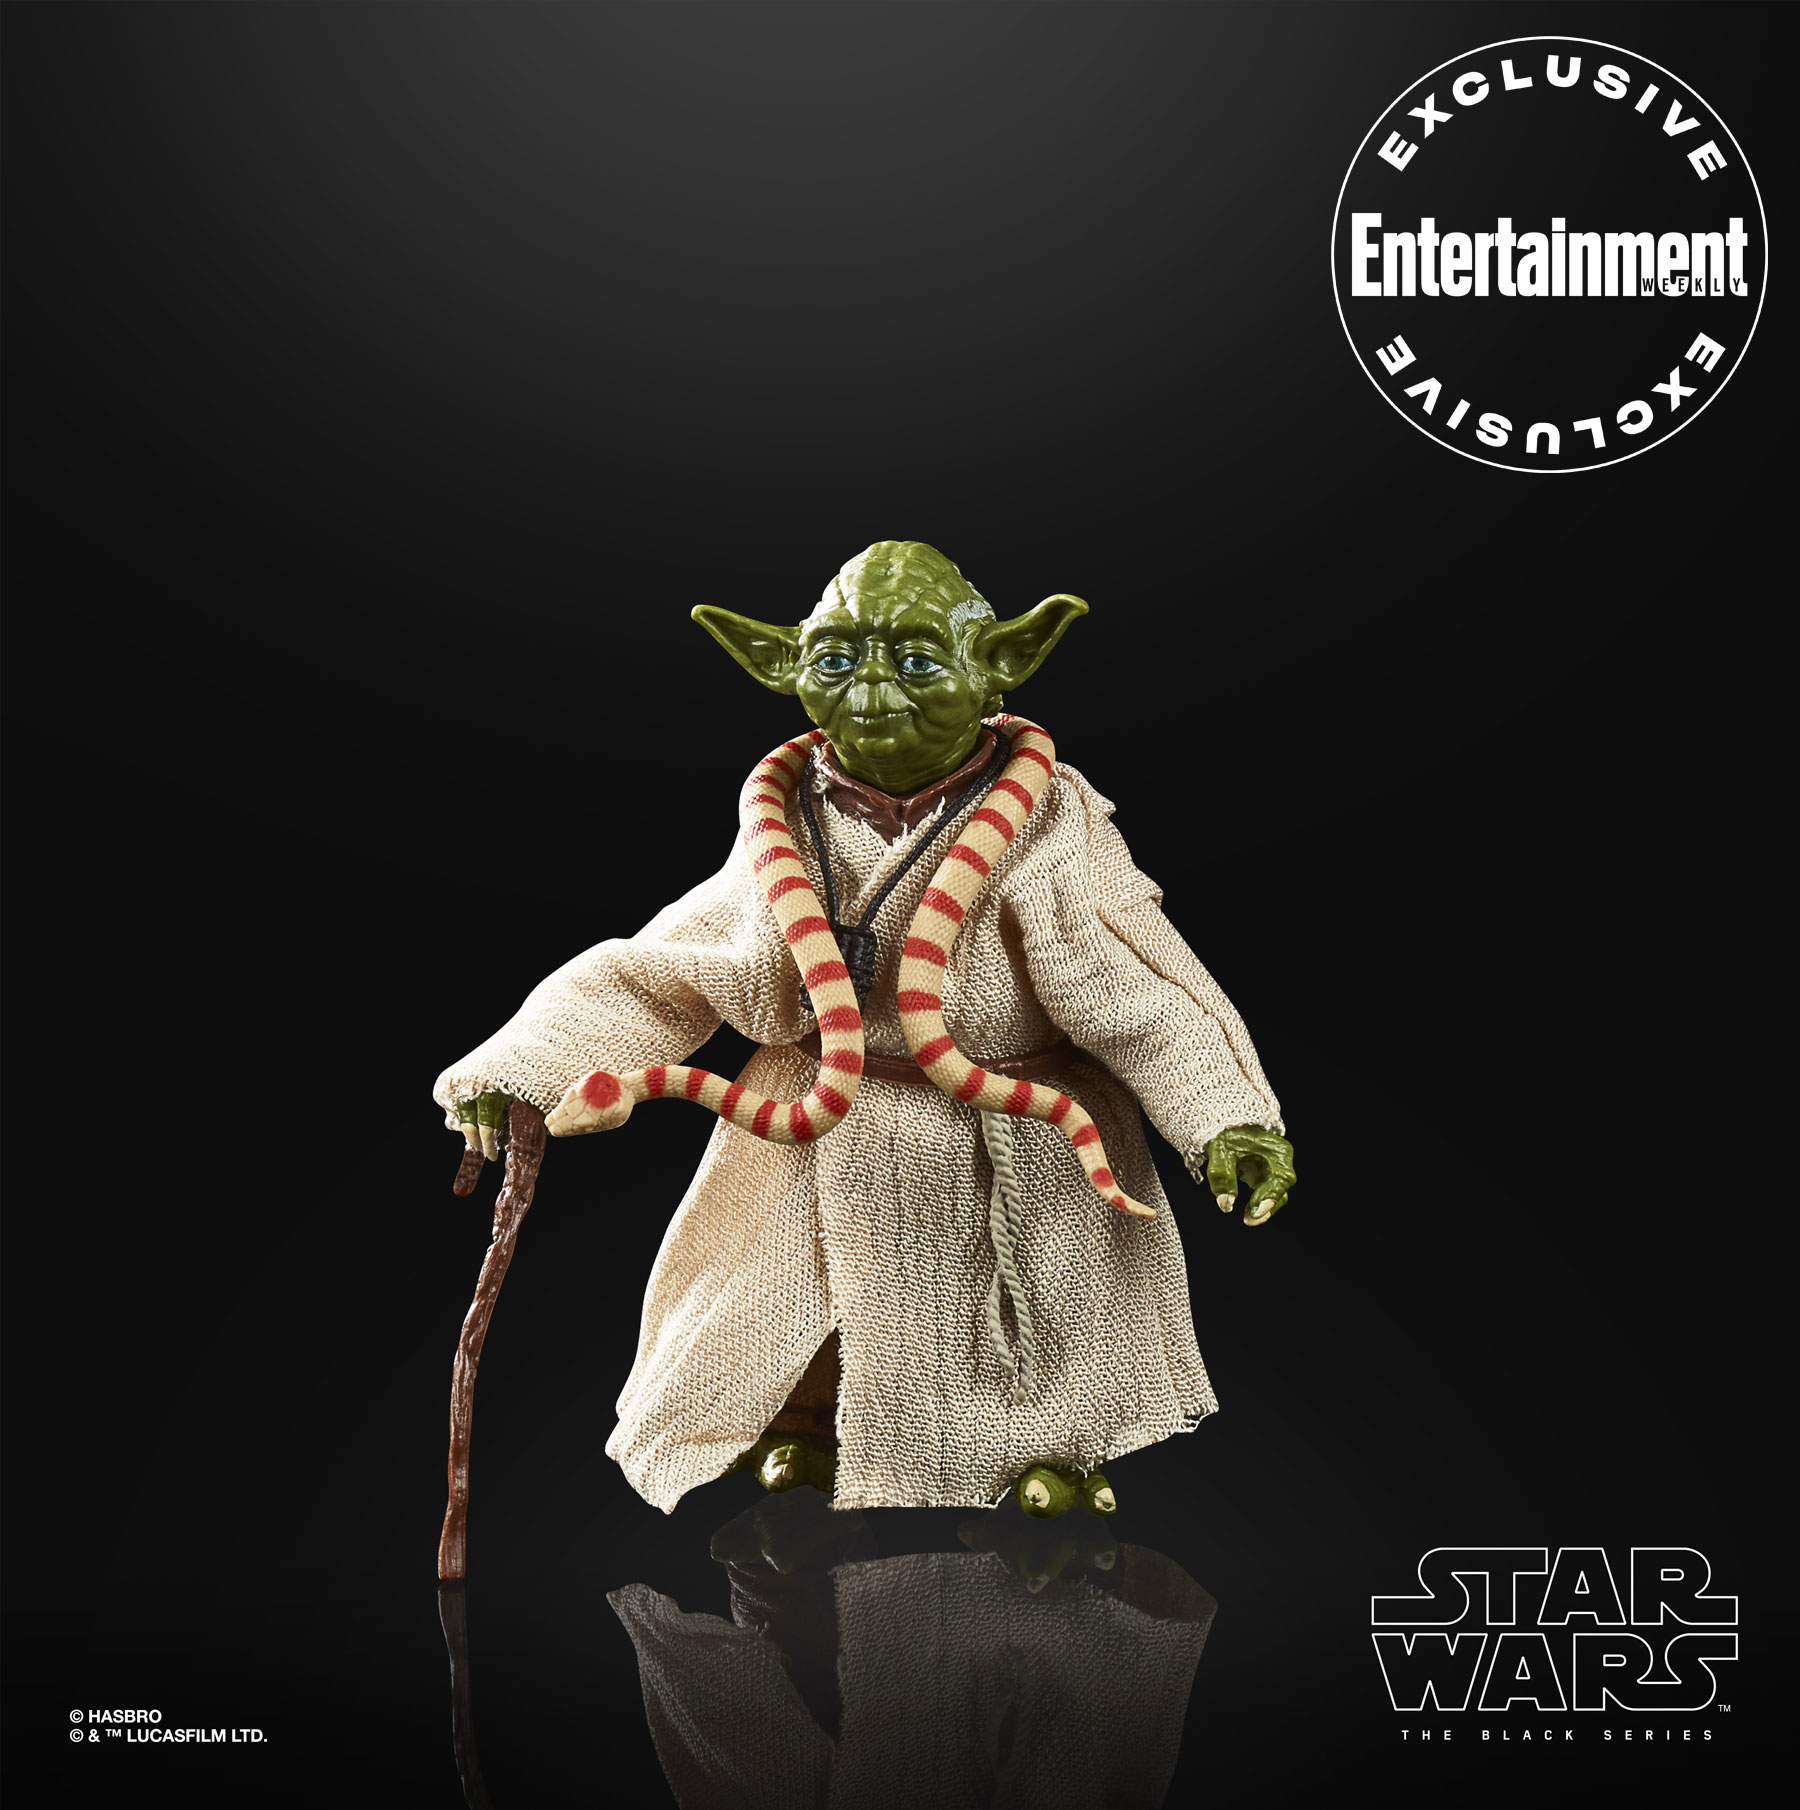 Star Wars: The Empire Strikes Back Hasbro toys